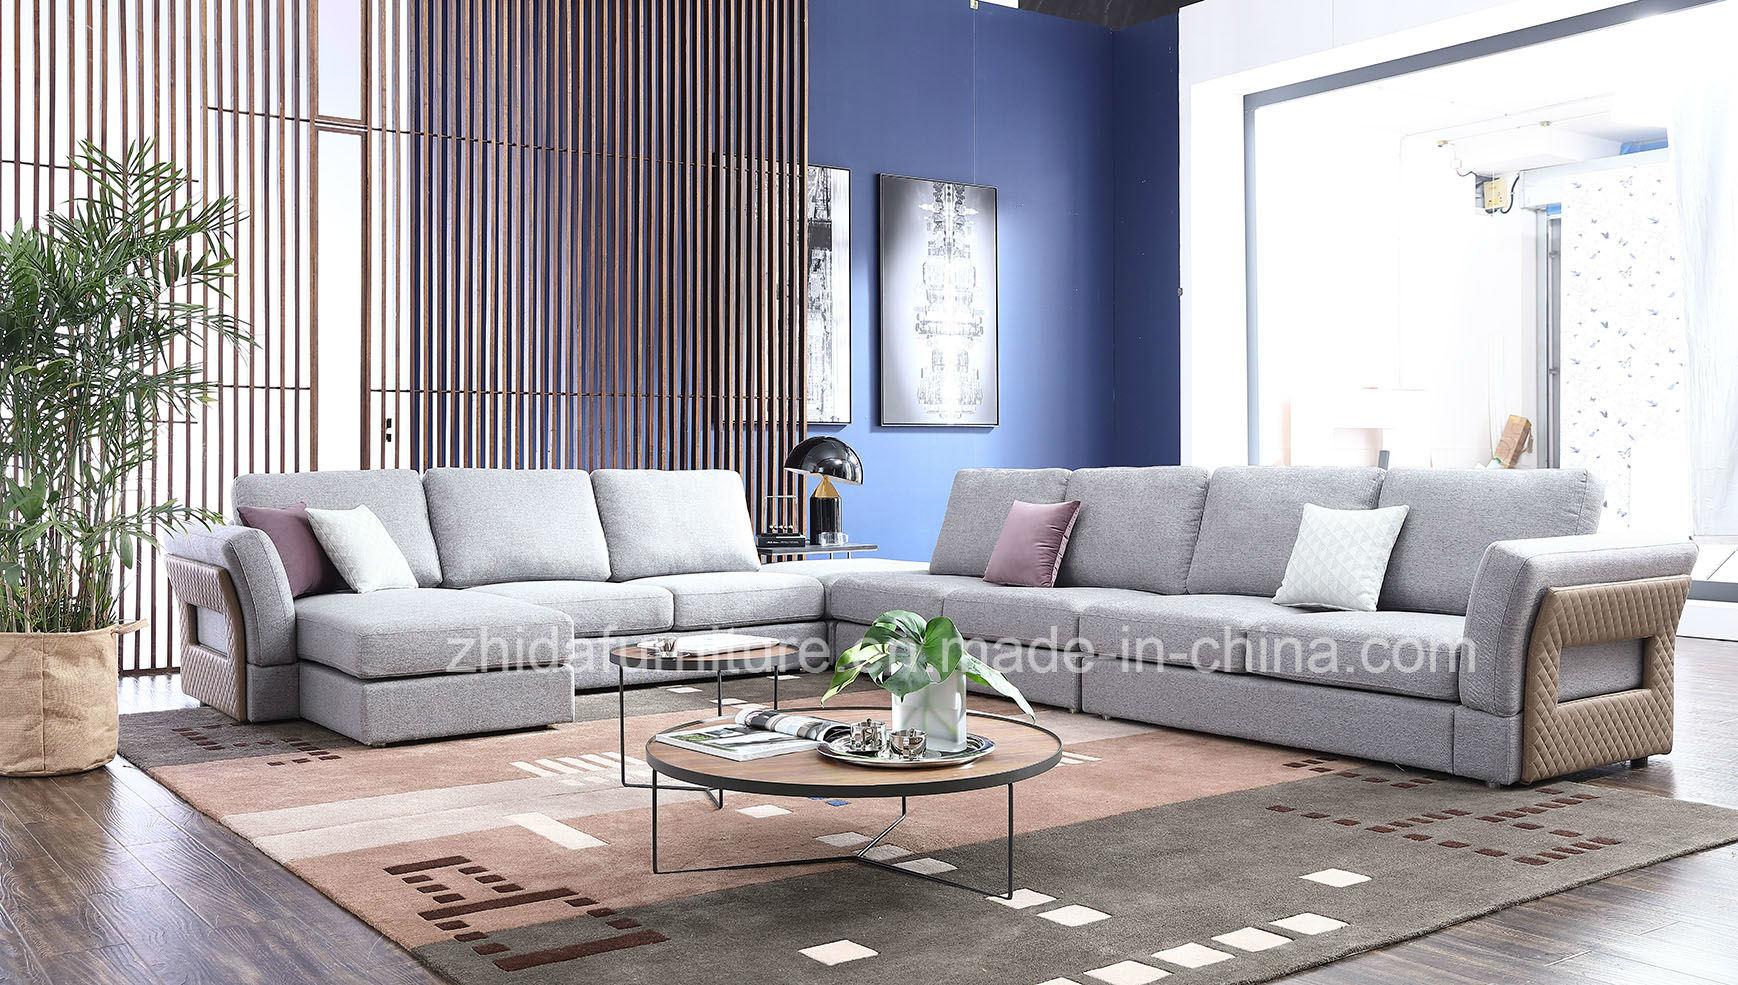 China New Design Modern Living Room Big Corner Sofa - China Big ...